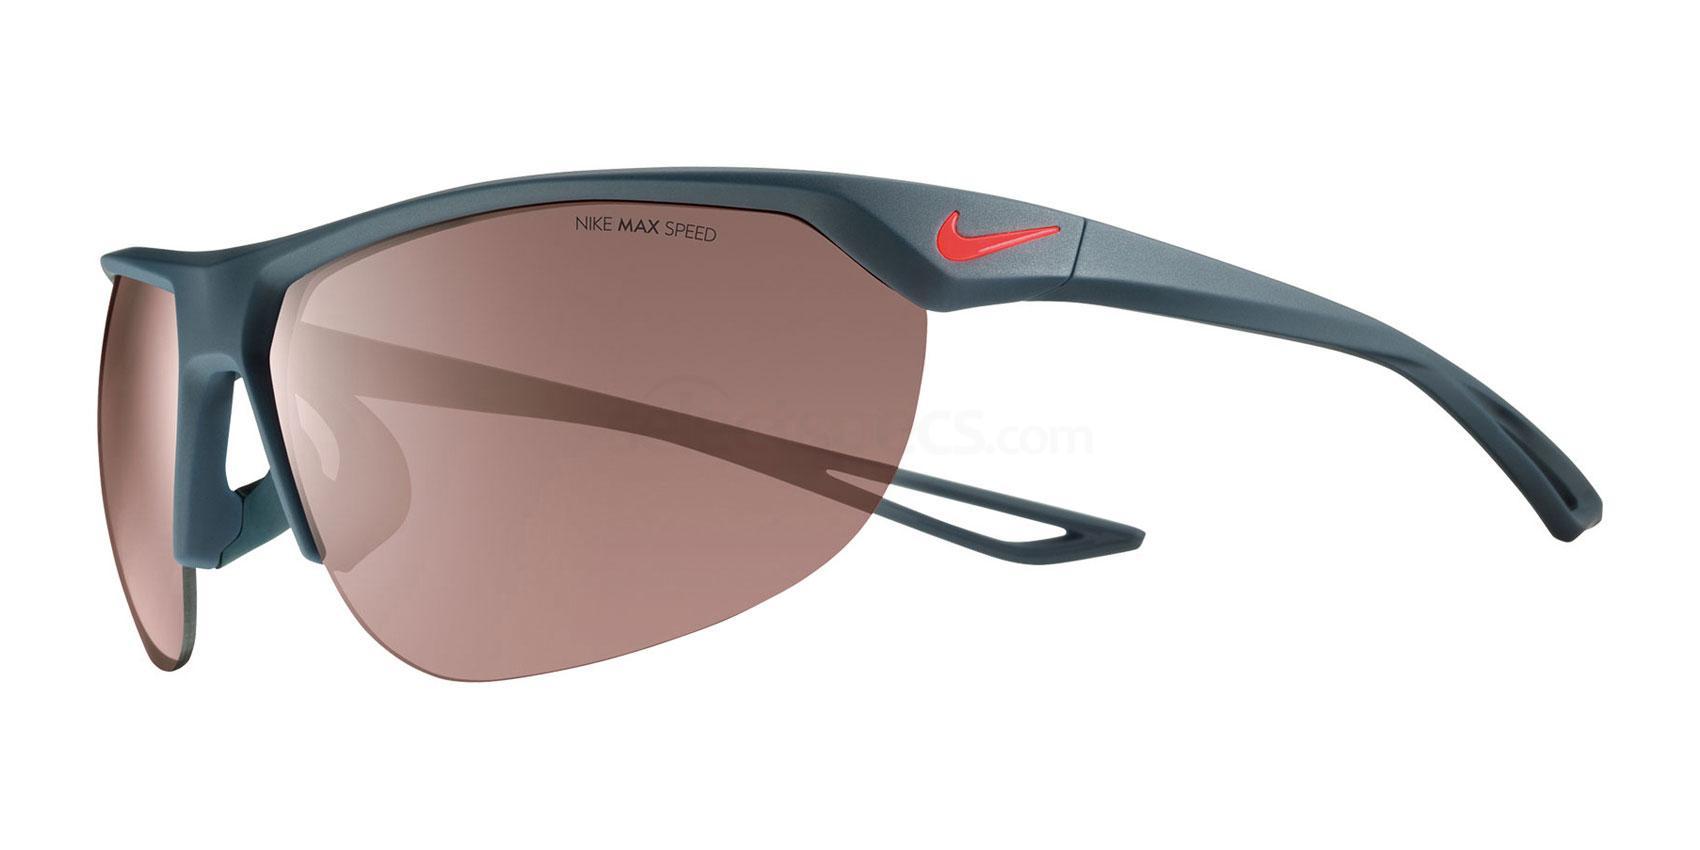 460 CROSS TRAINER E EV0938 Sunglasses, Nike